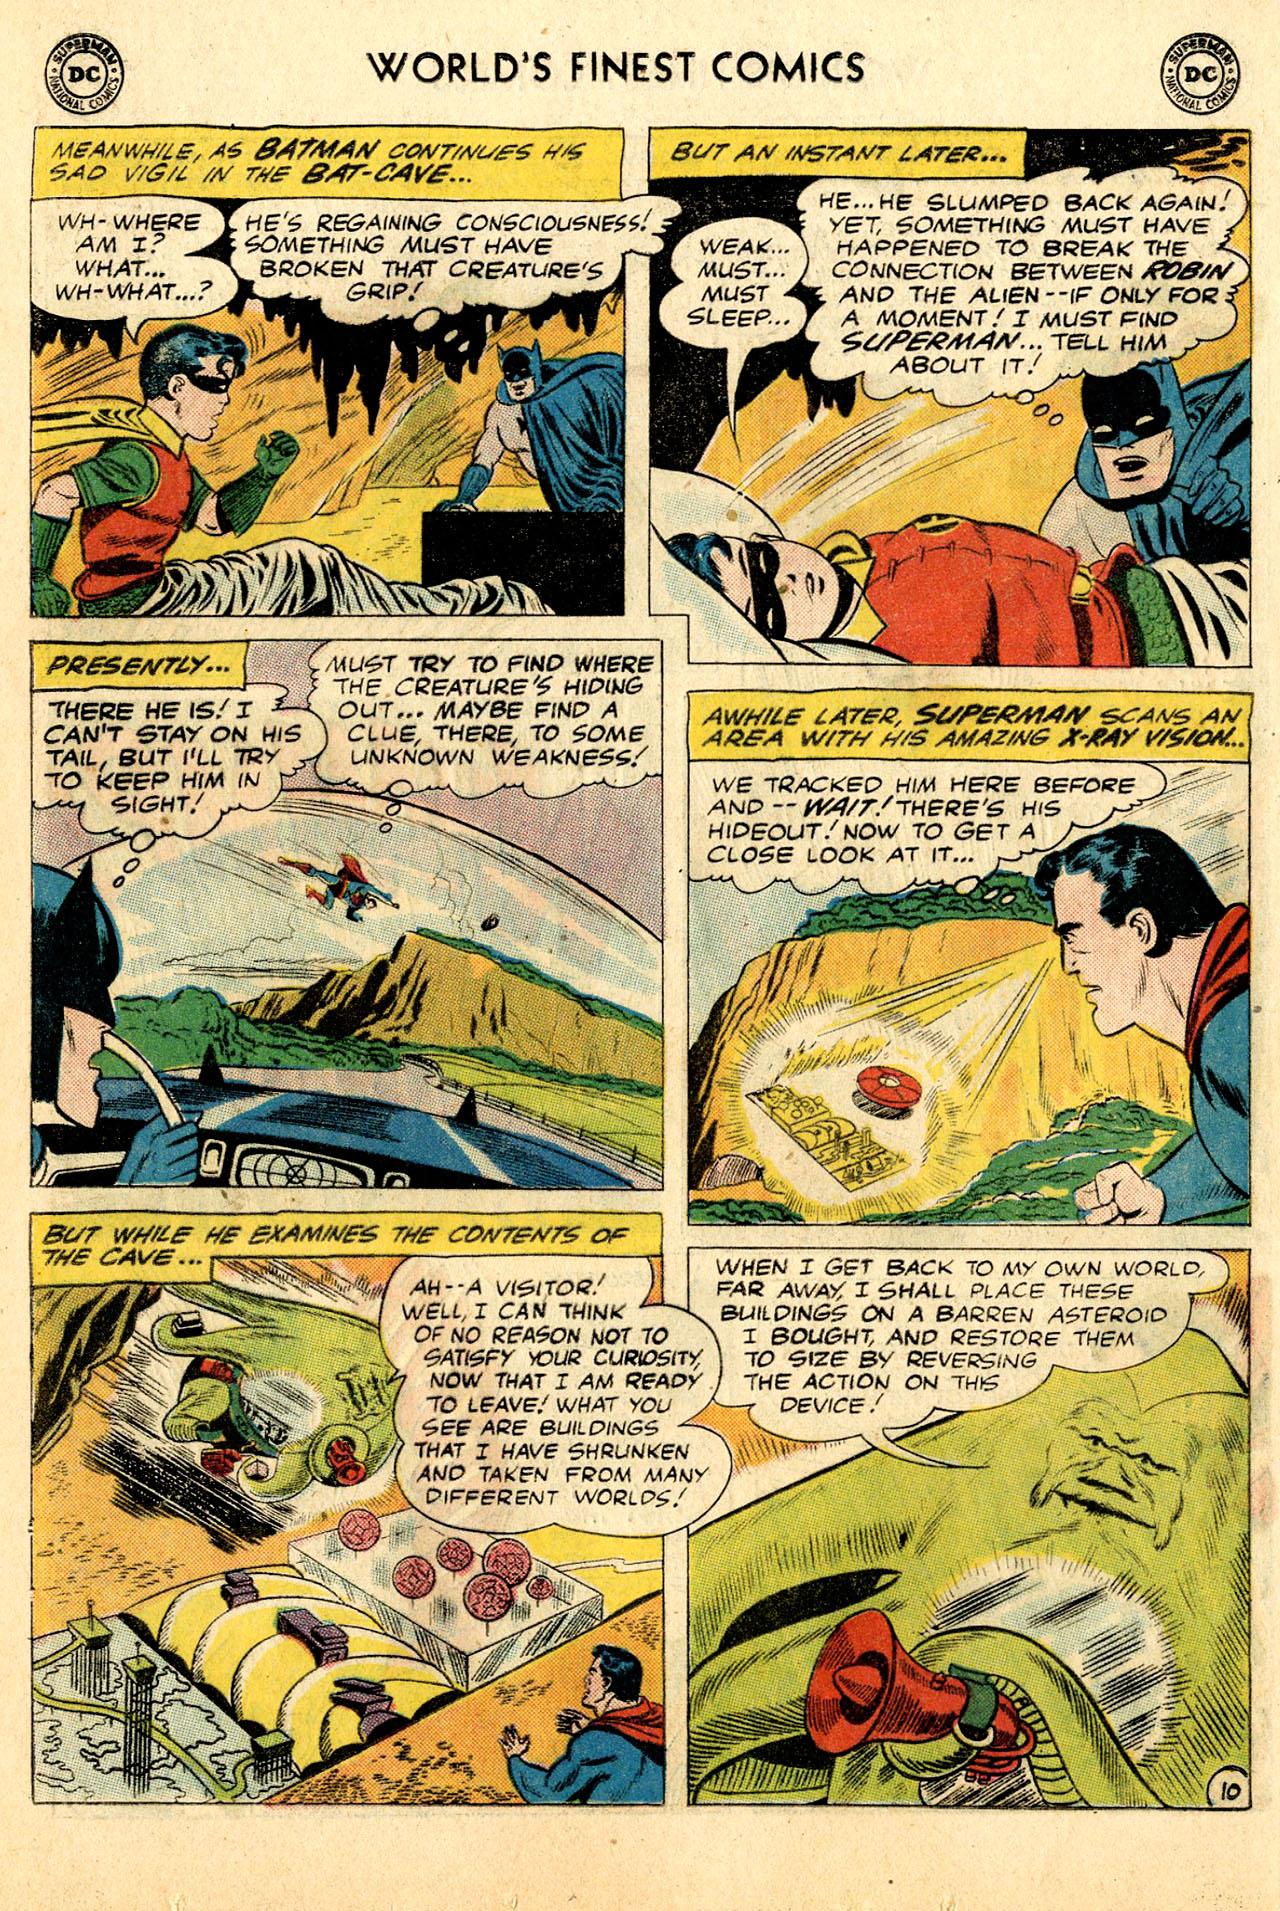 Read online World's Finest Comics comic -  Issue #110 - 12